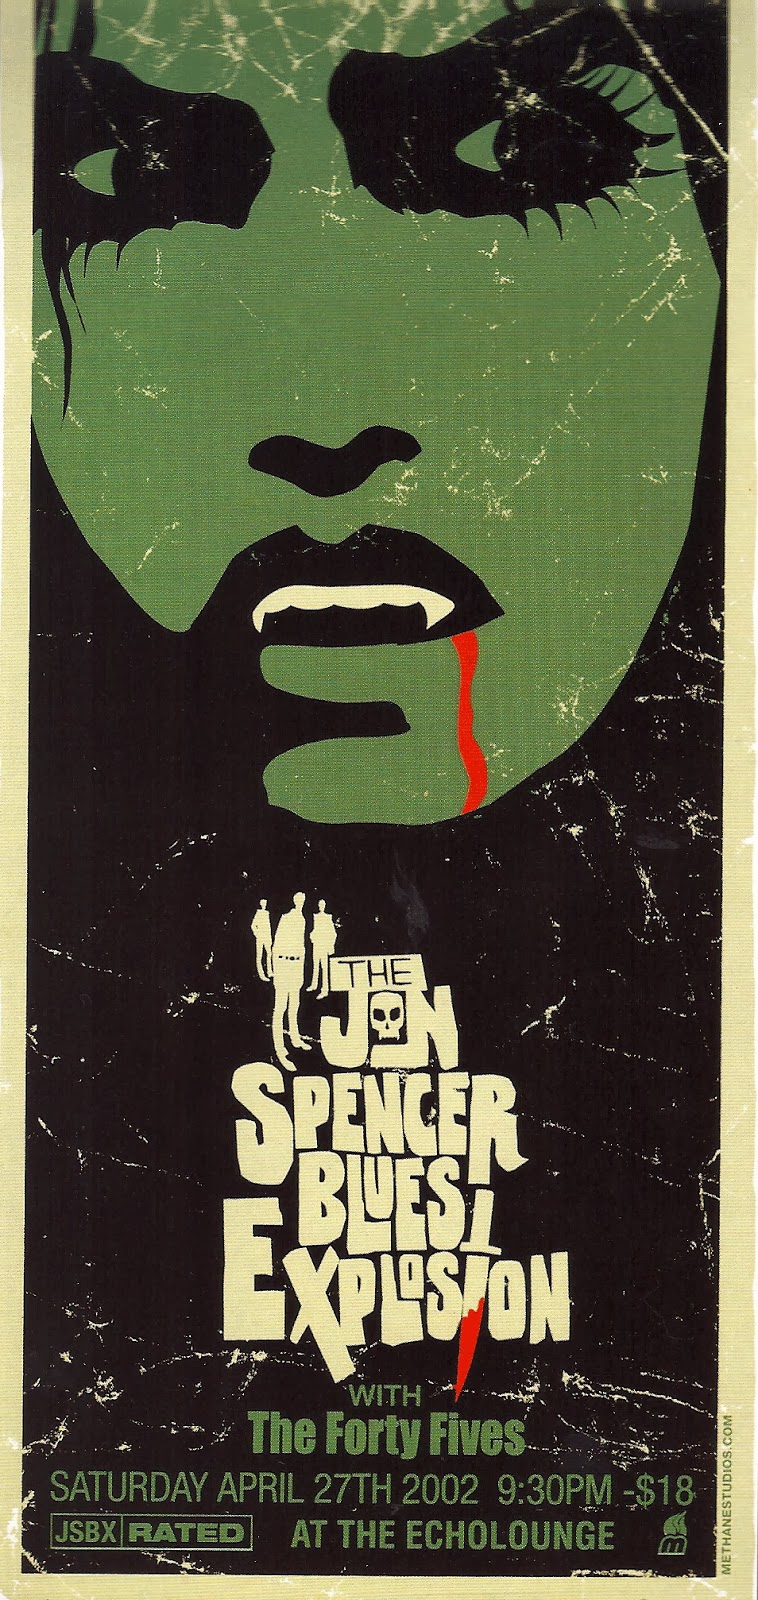 The Jon Spencer Blues Explosion - Echo Lounge, Atlanta, GA, US (27 April 2002)